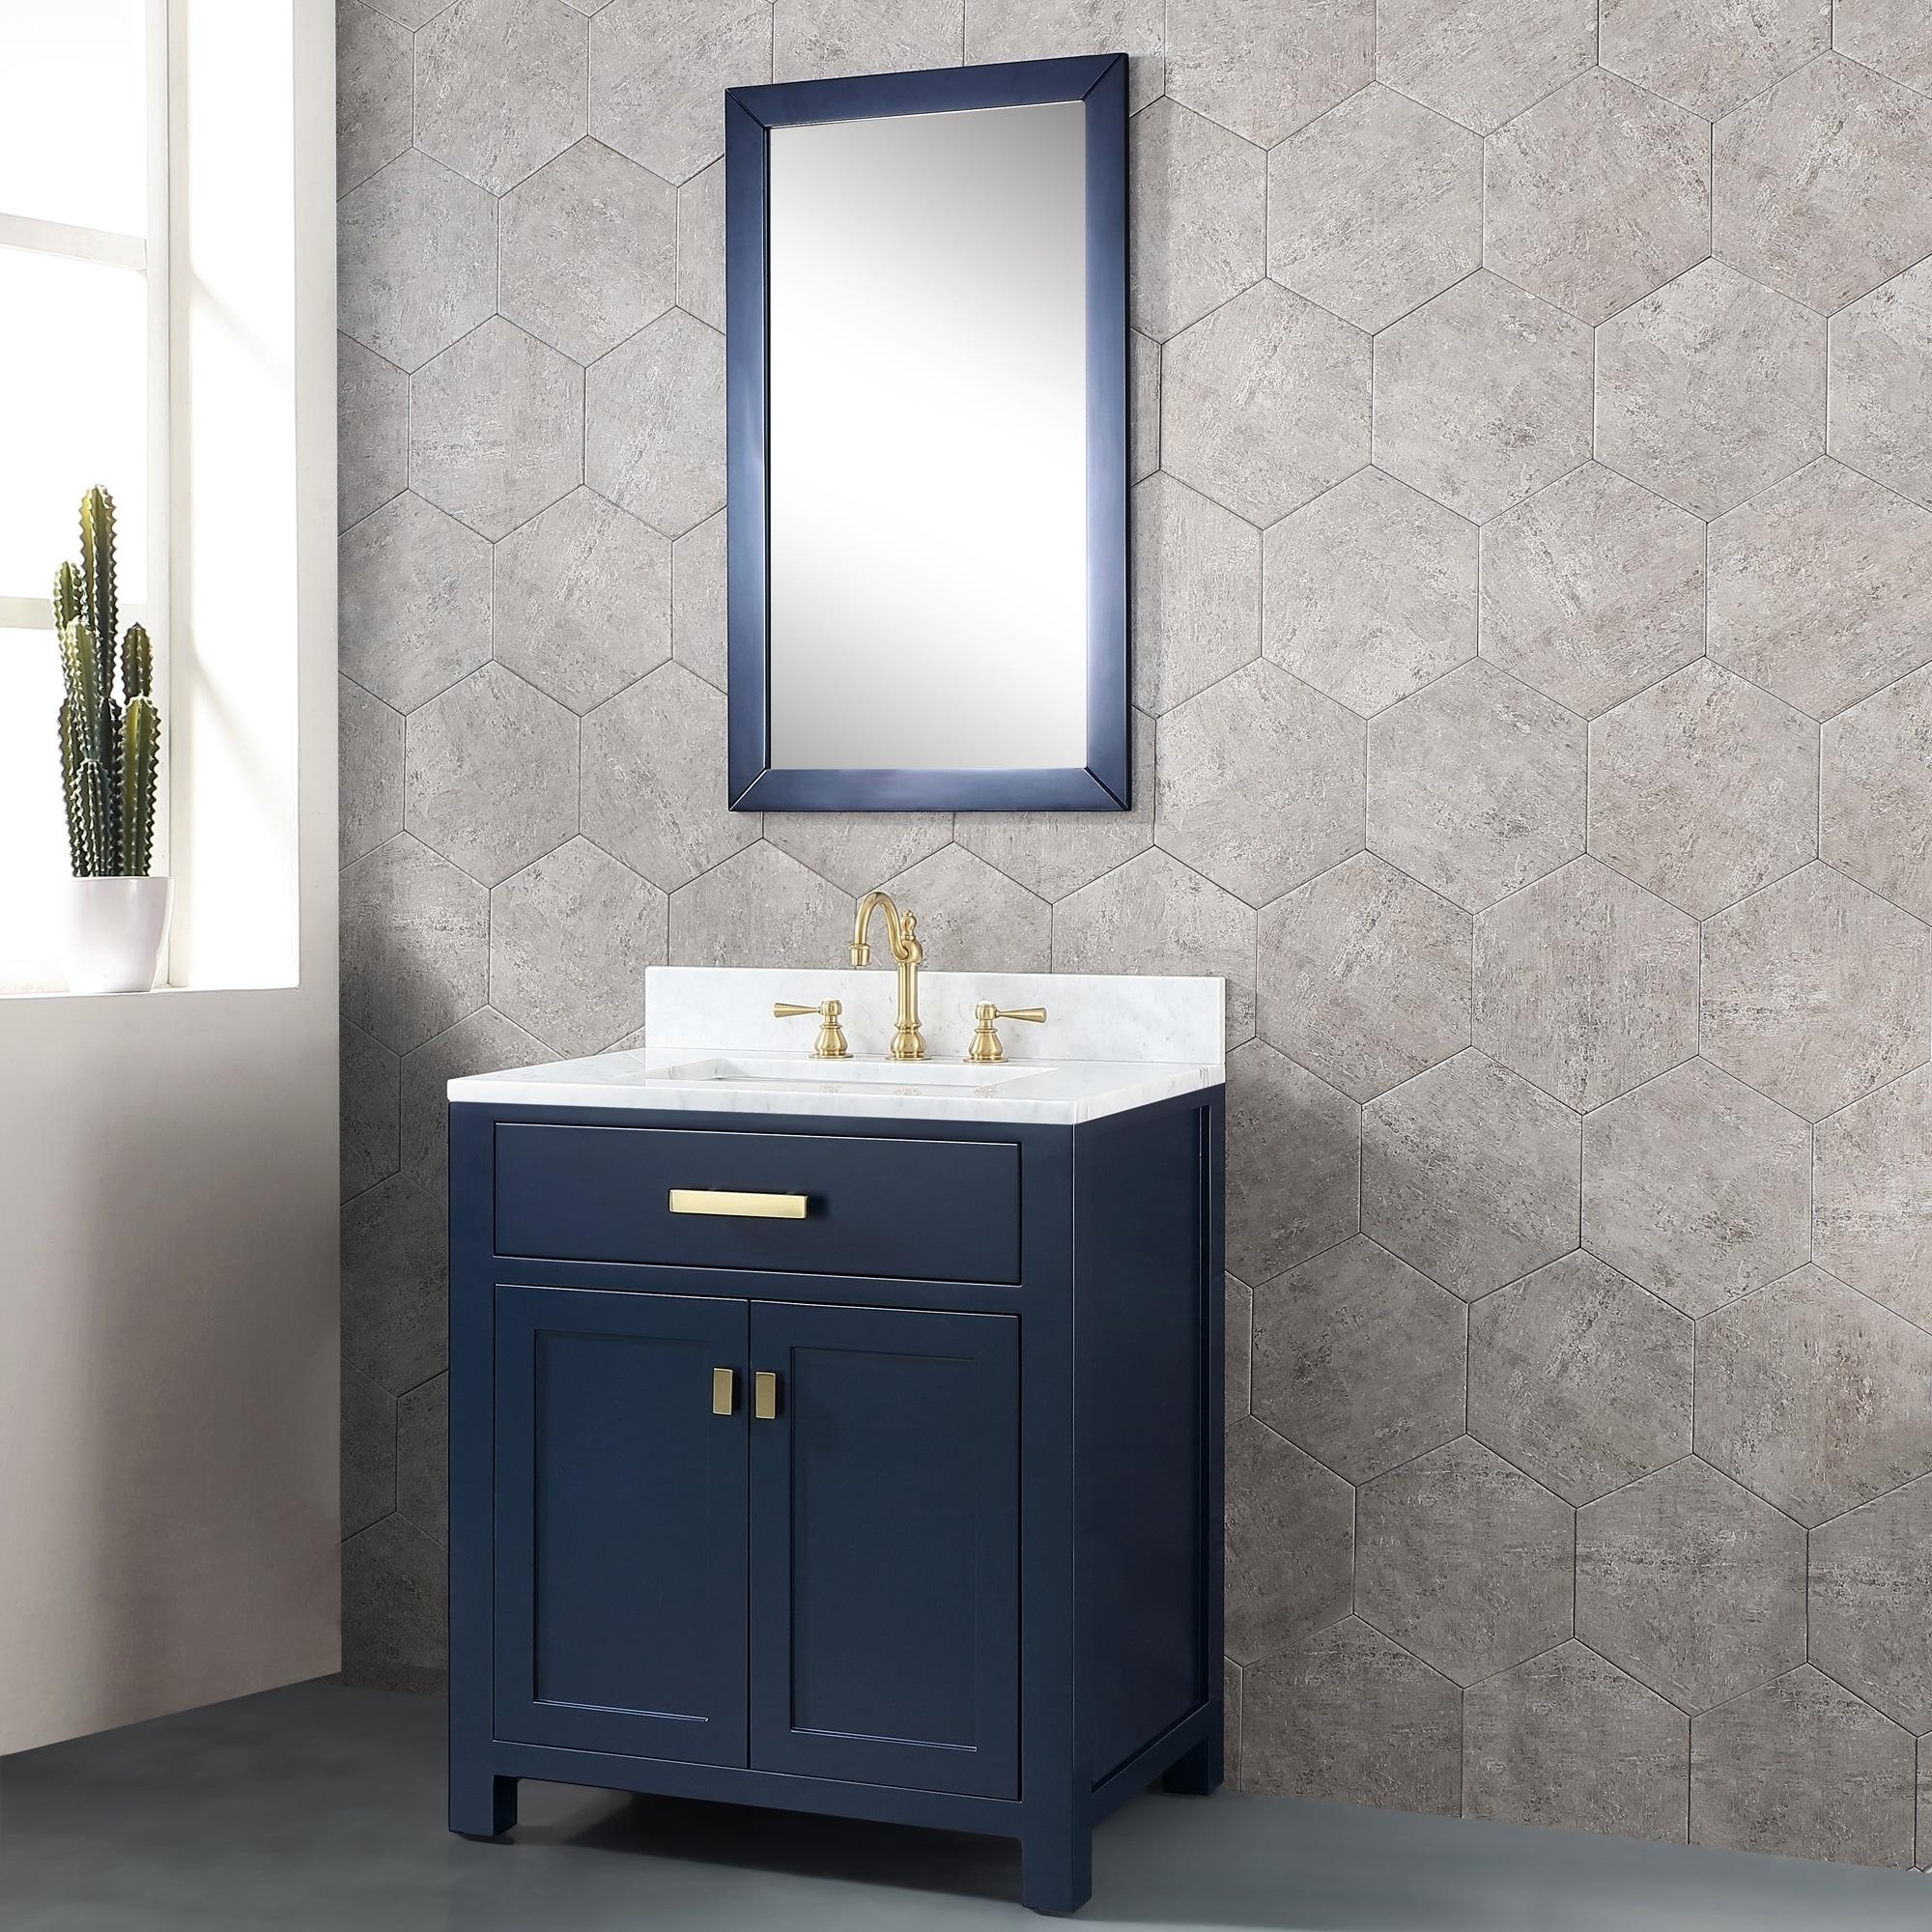 Madison 30 In Single Sink Carrara White Marble Vanity Monarch Blue